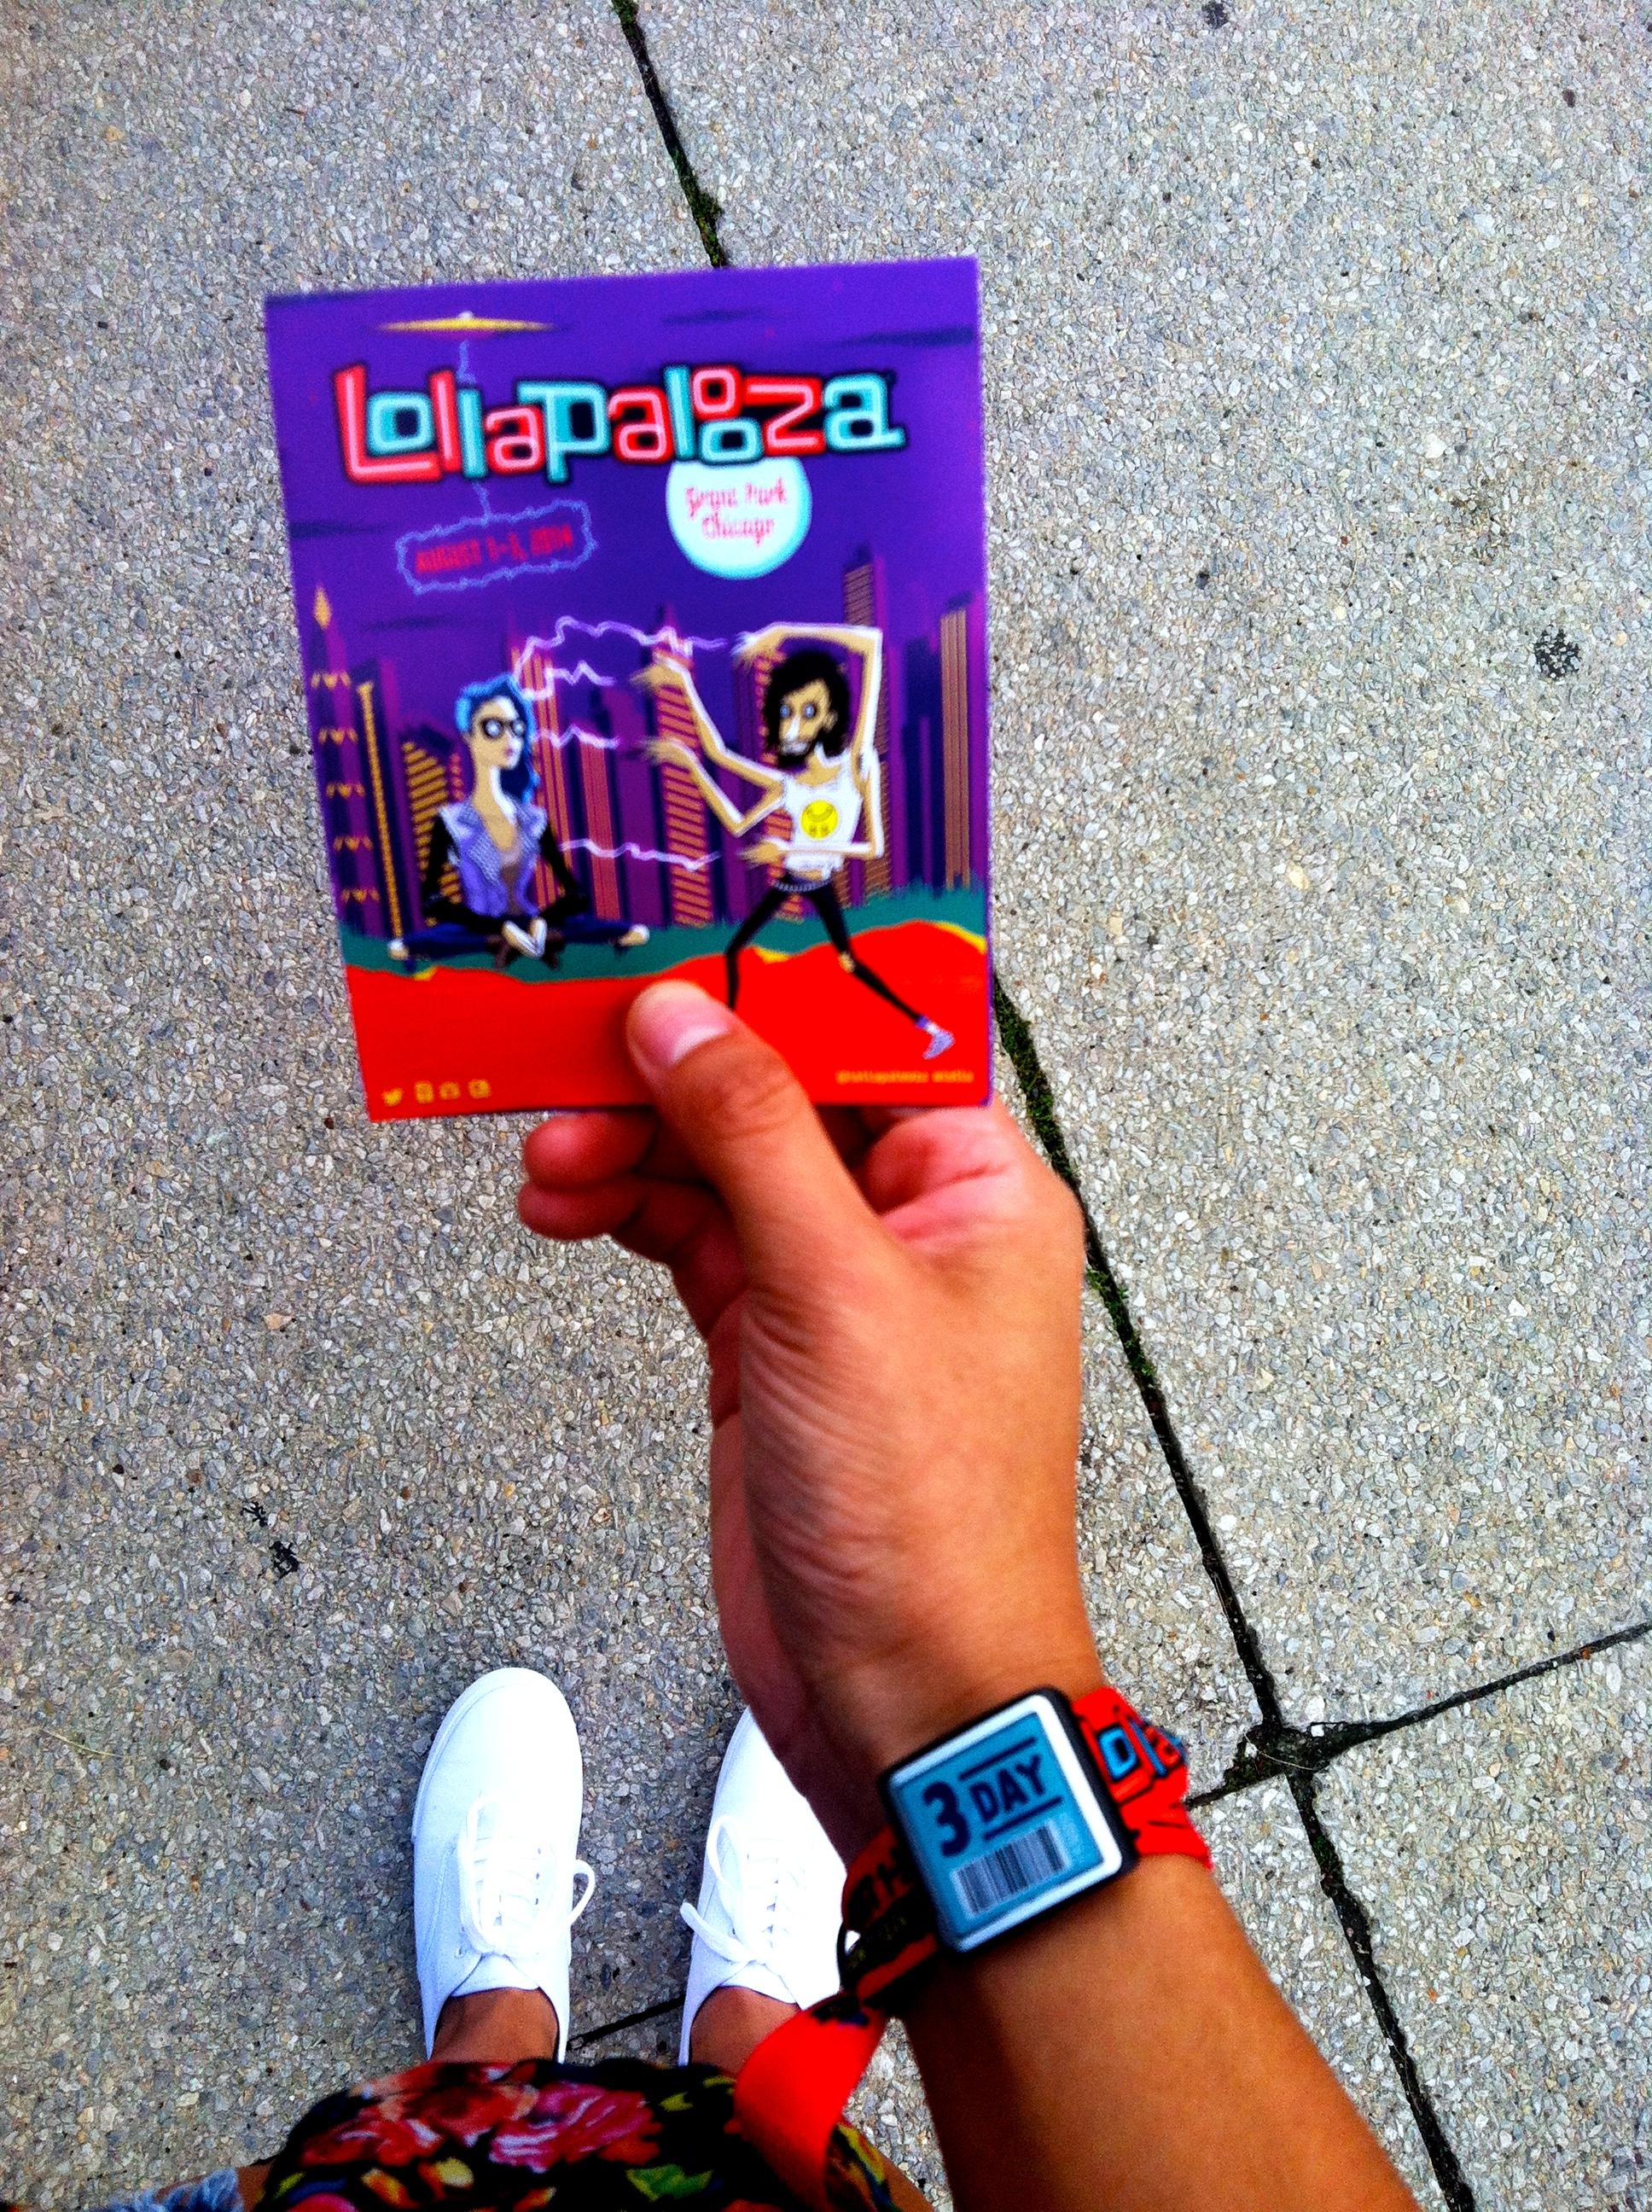 The Lollapalooza Life